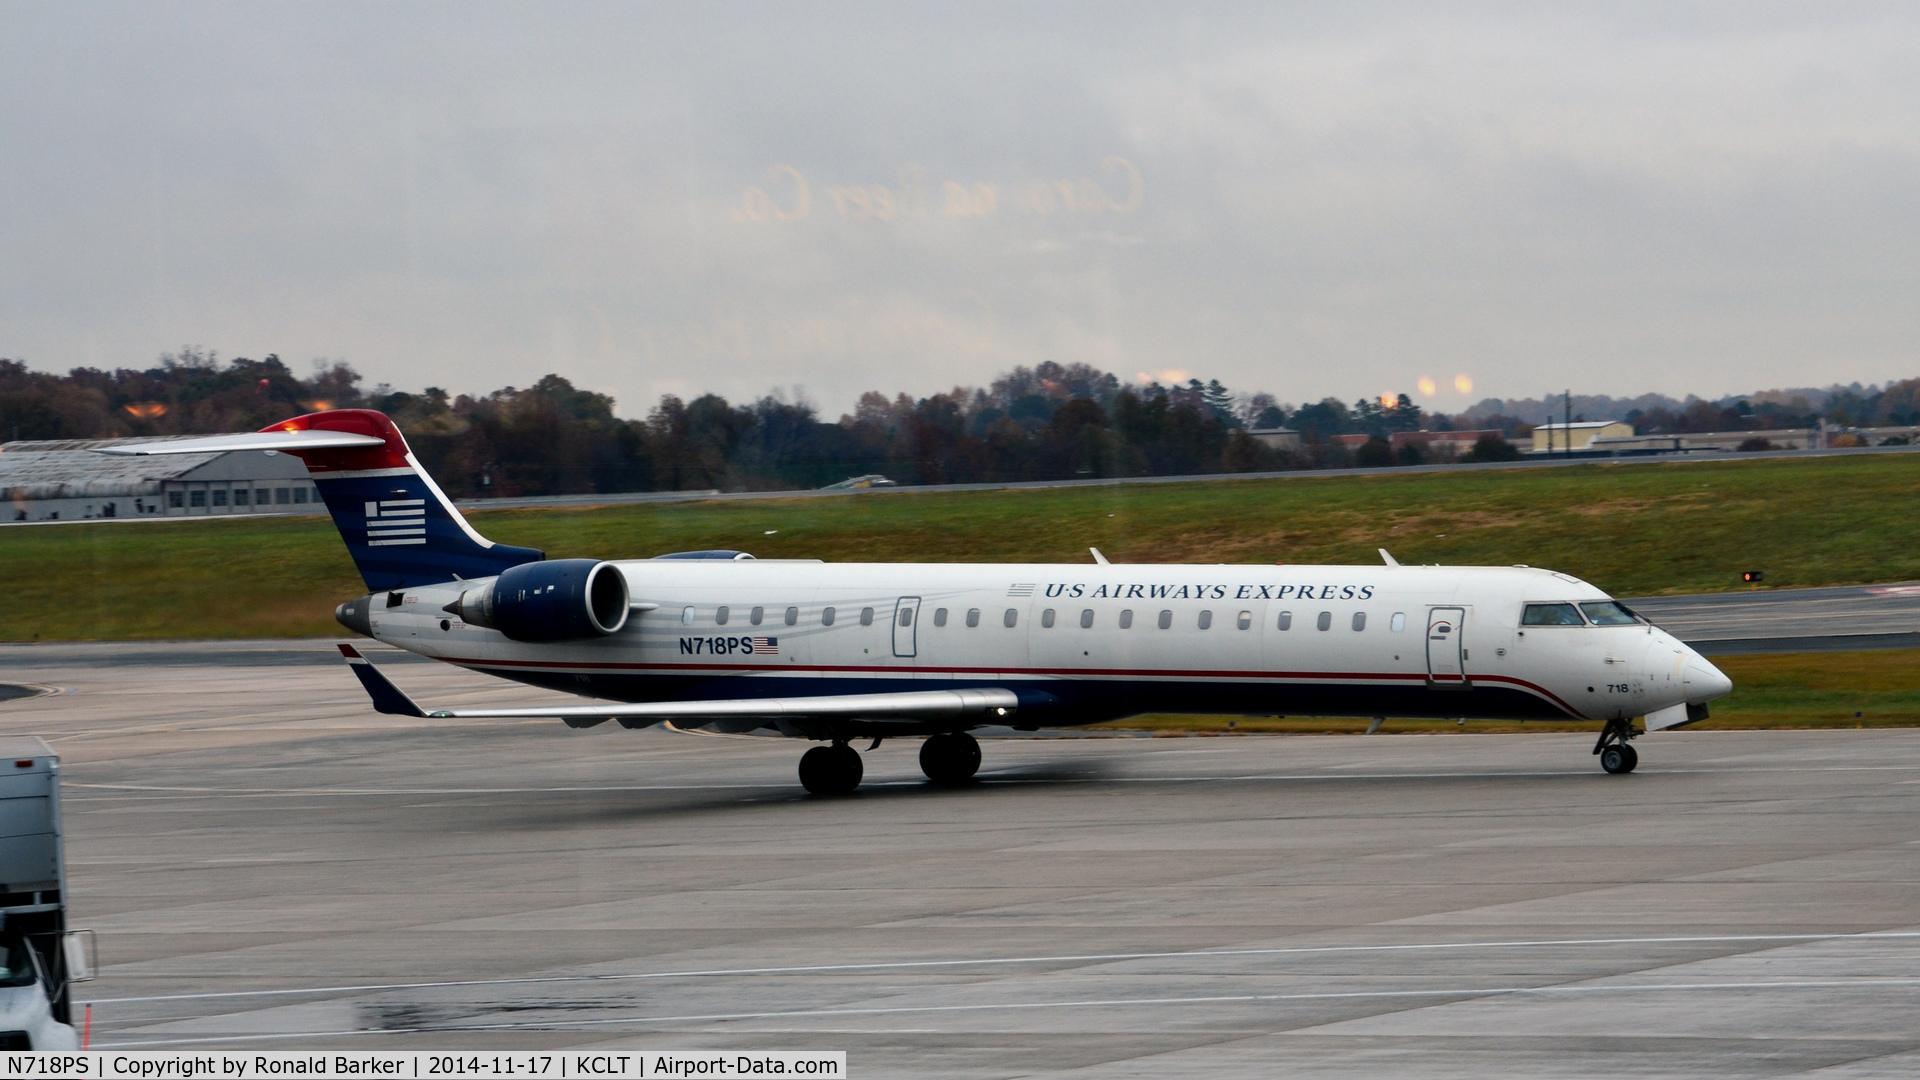 N718PS, 2004 Bombardier CRJ-701 (CL-600-2C10) Regional Jet C/N 10175, Taxi CLT